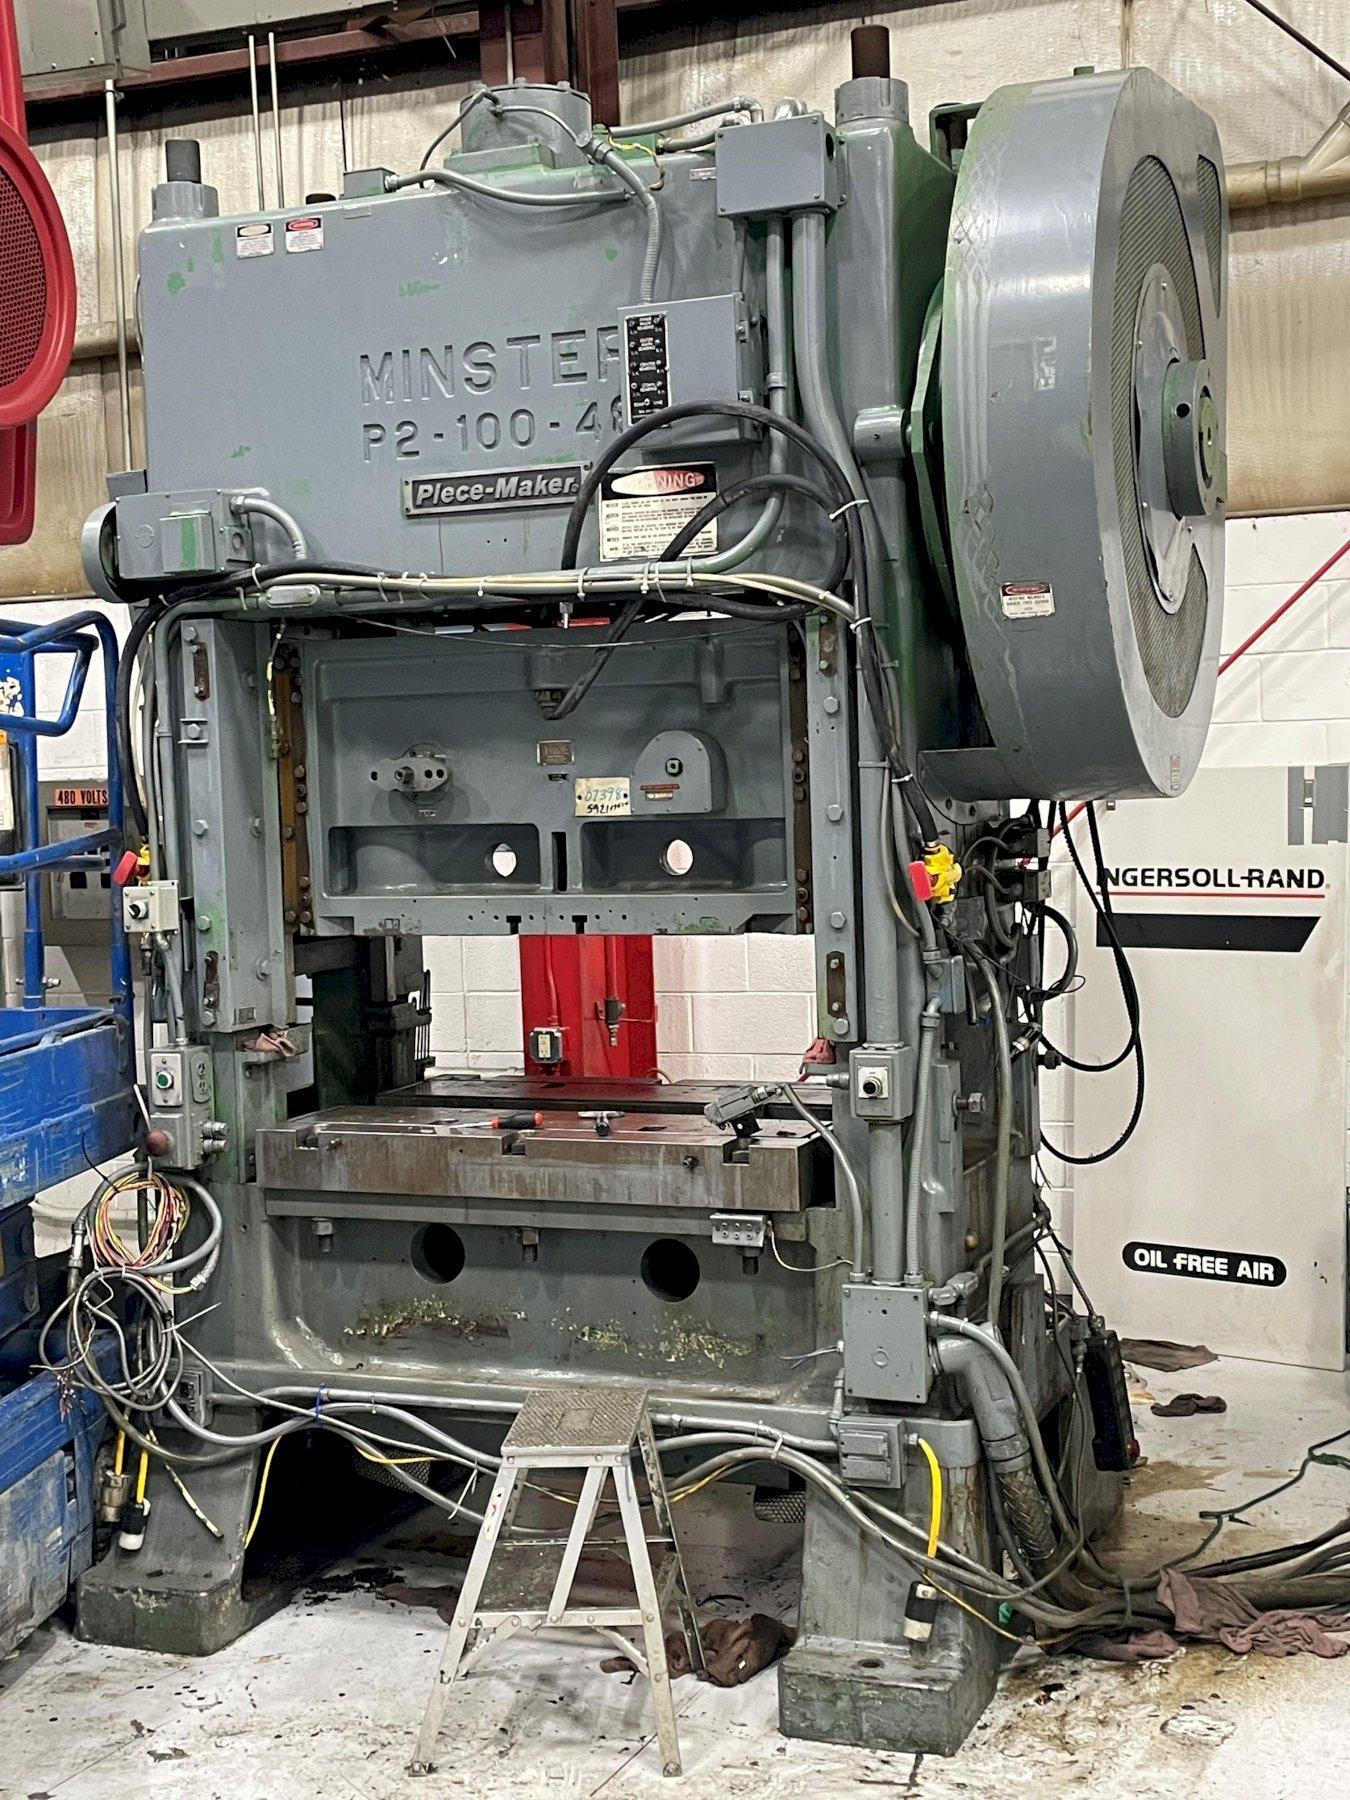 100 ton Minster P2-100-48 Piece-Maker SSDC Press